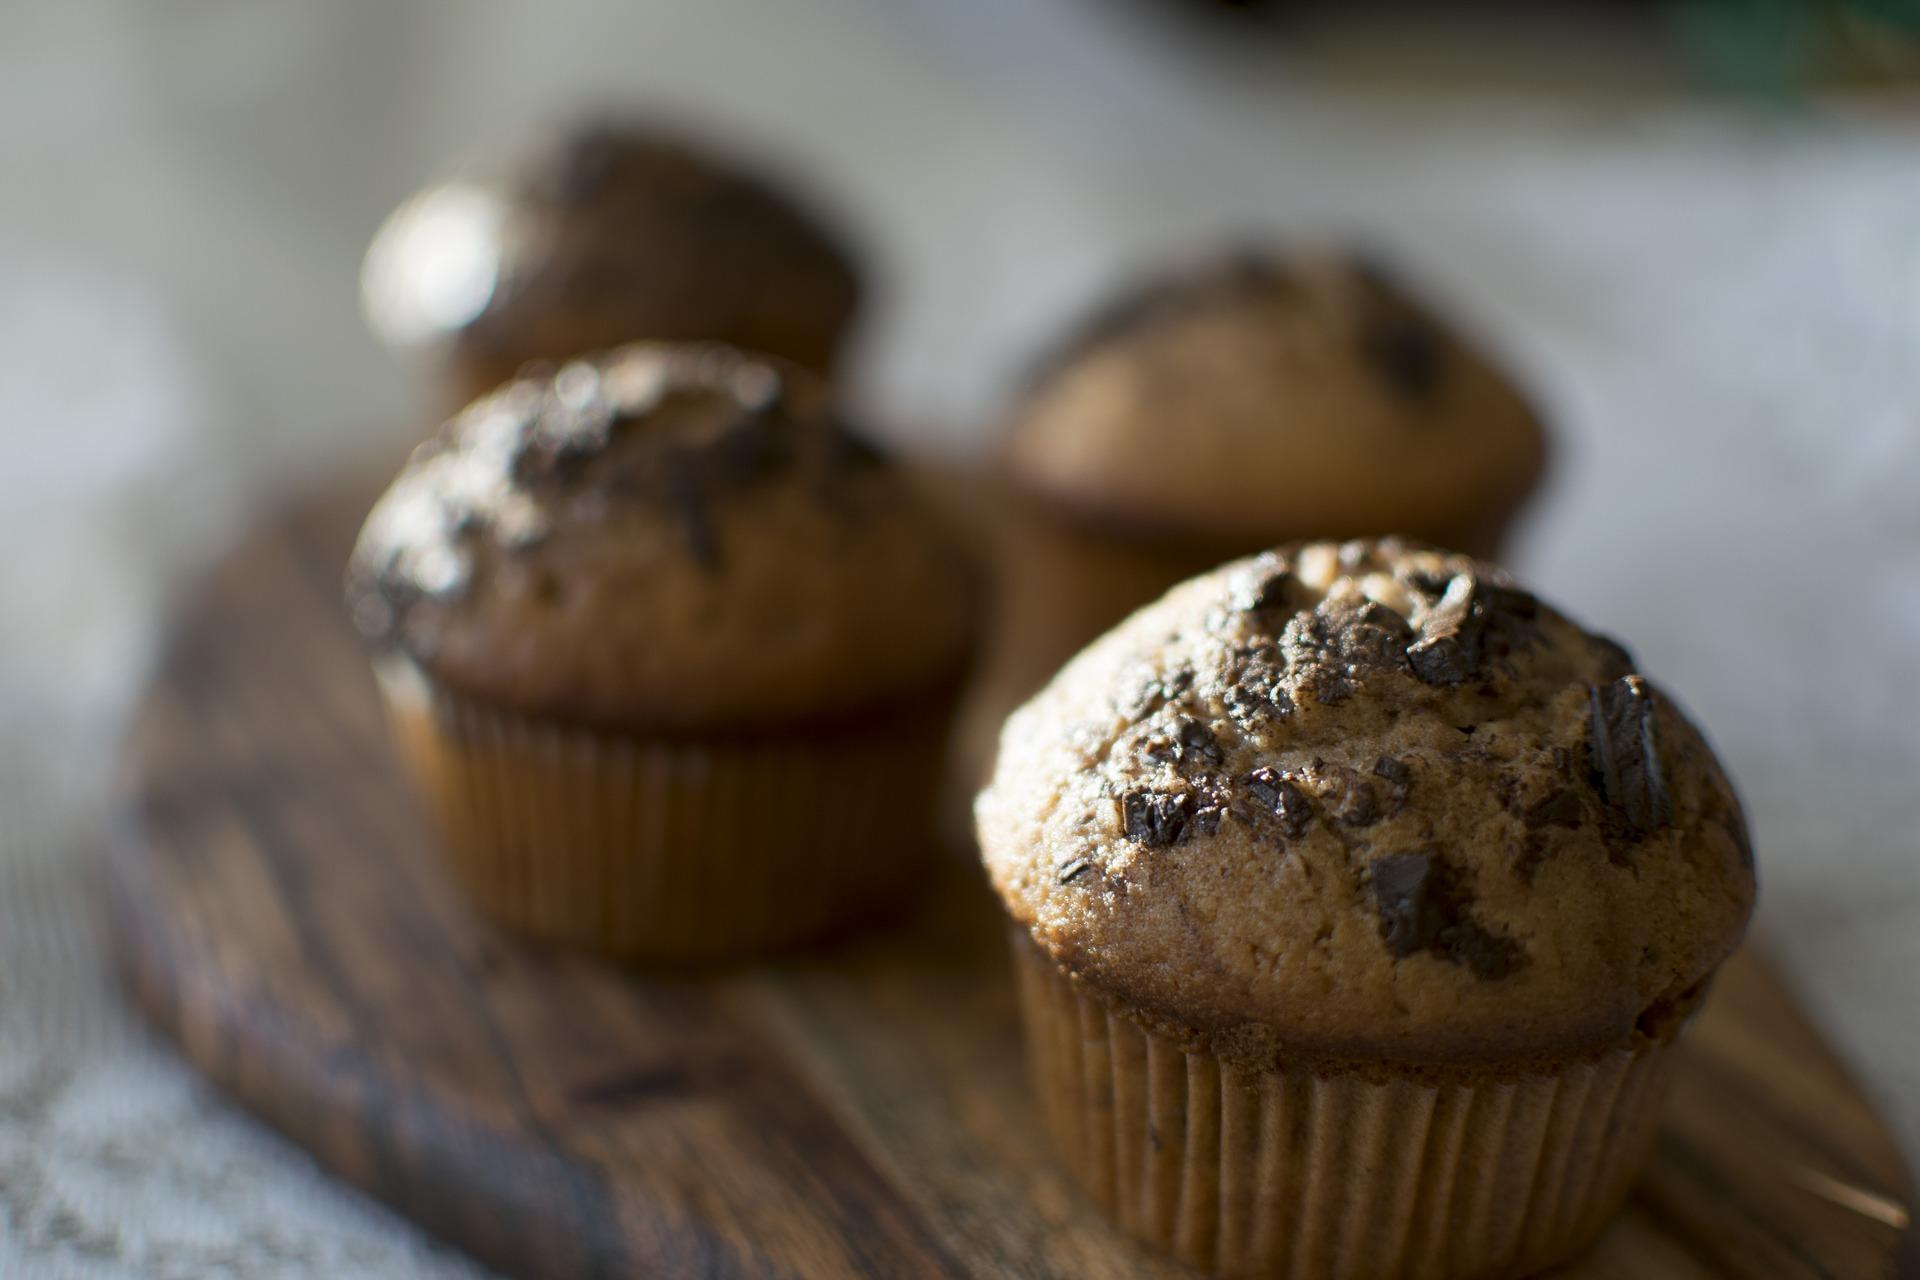 Briose cu ciocolata si stafide - sfatulparintilor.ro - pixabay_com - muffins-3736180_1920